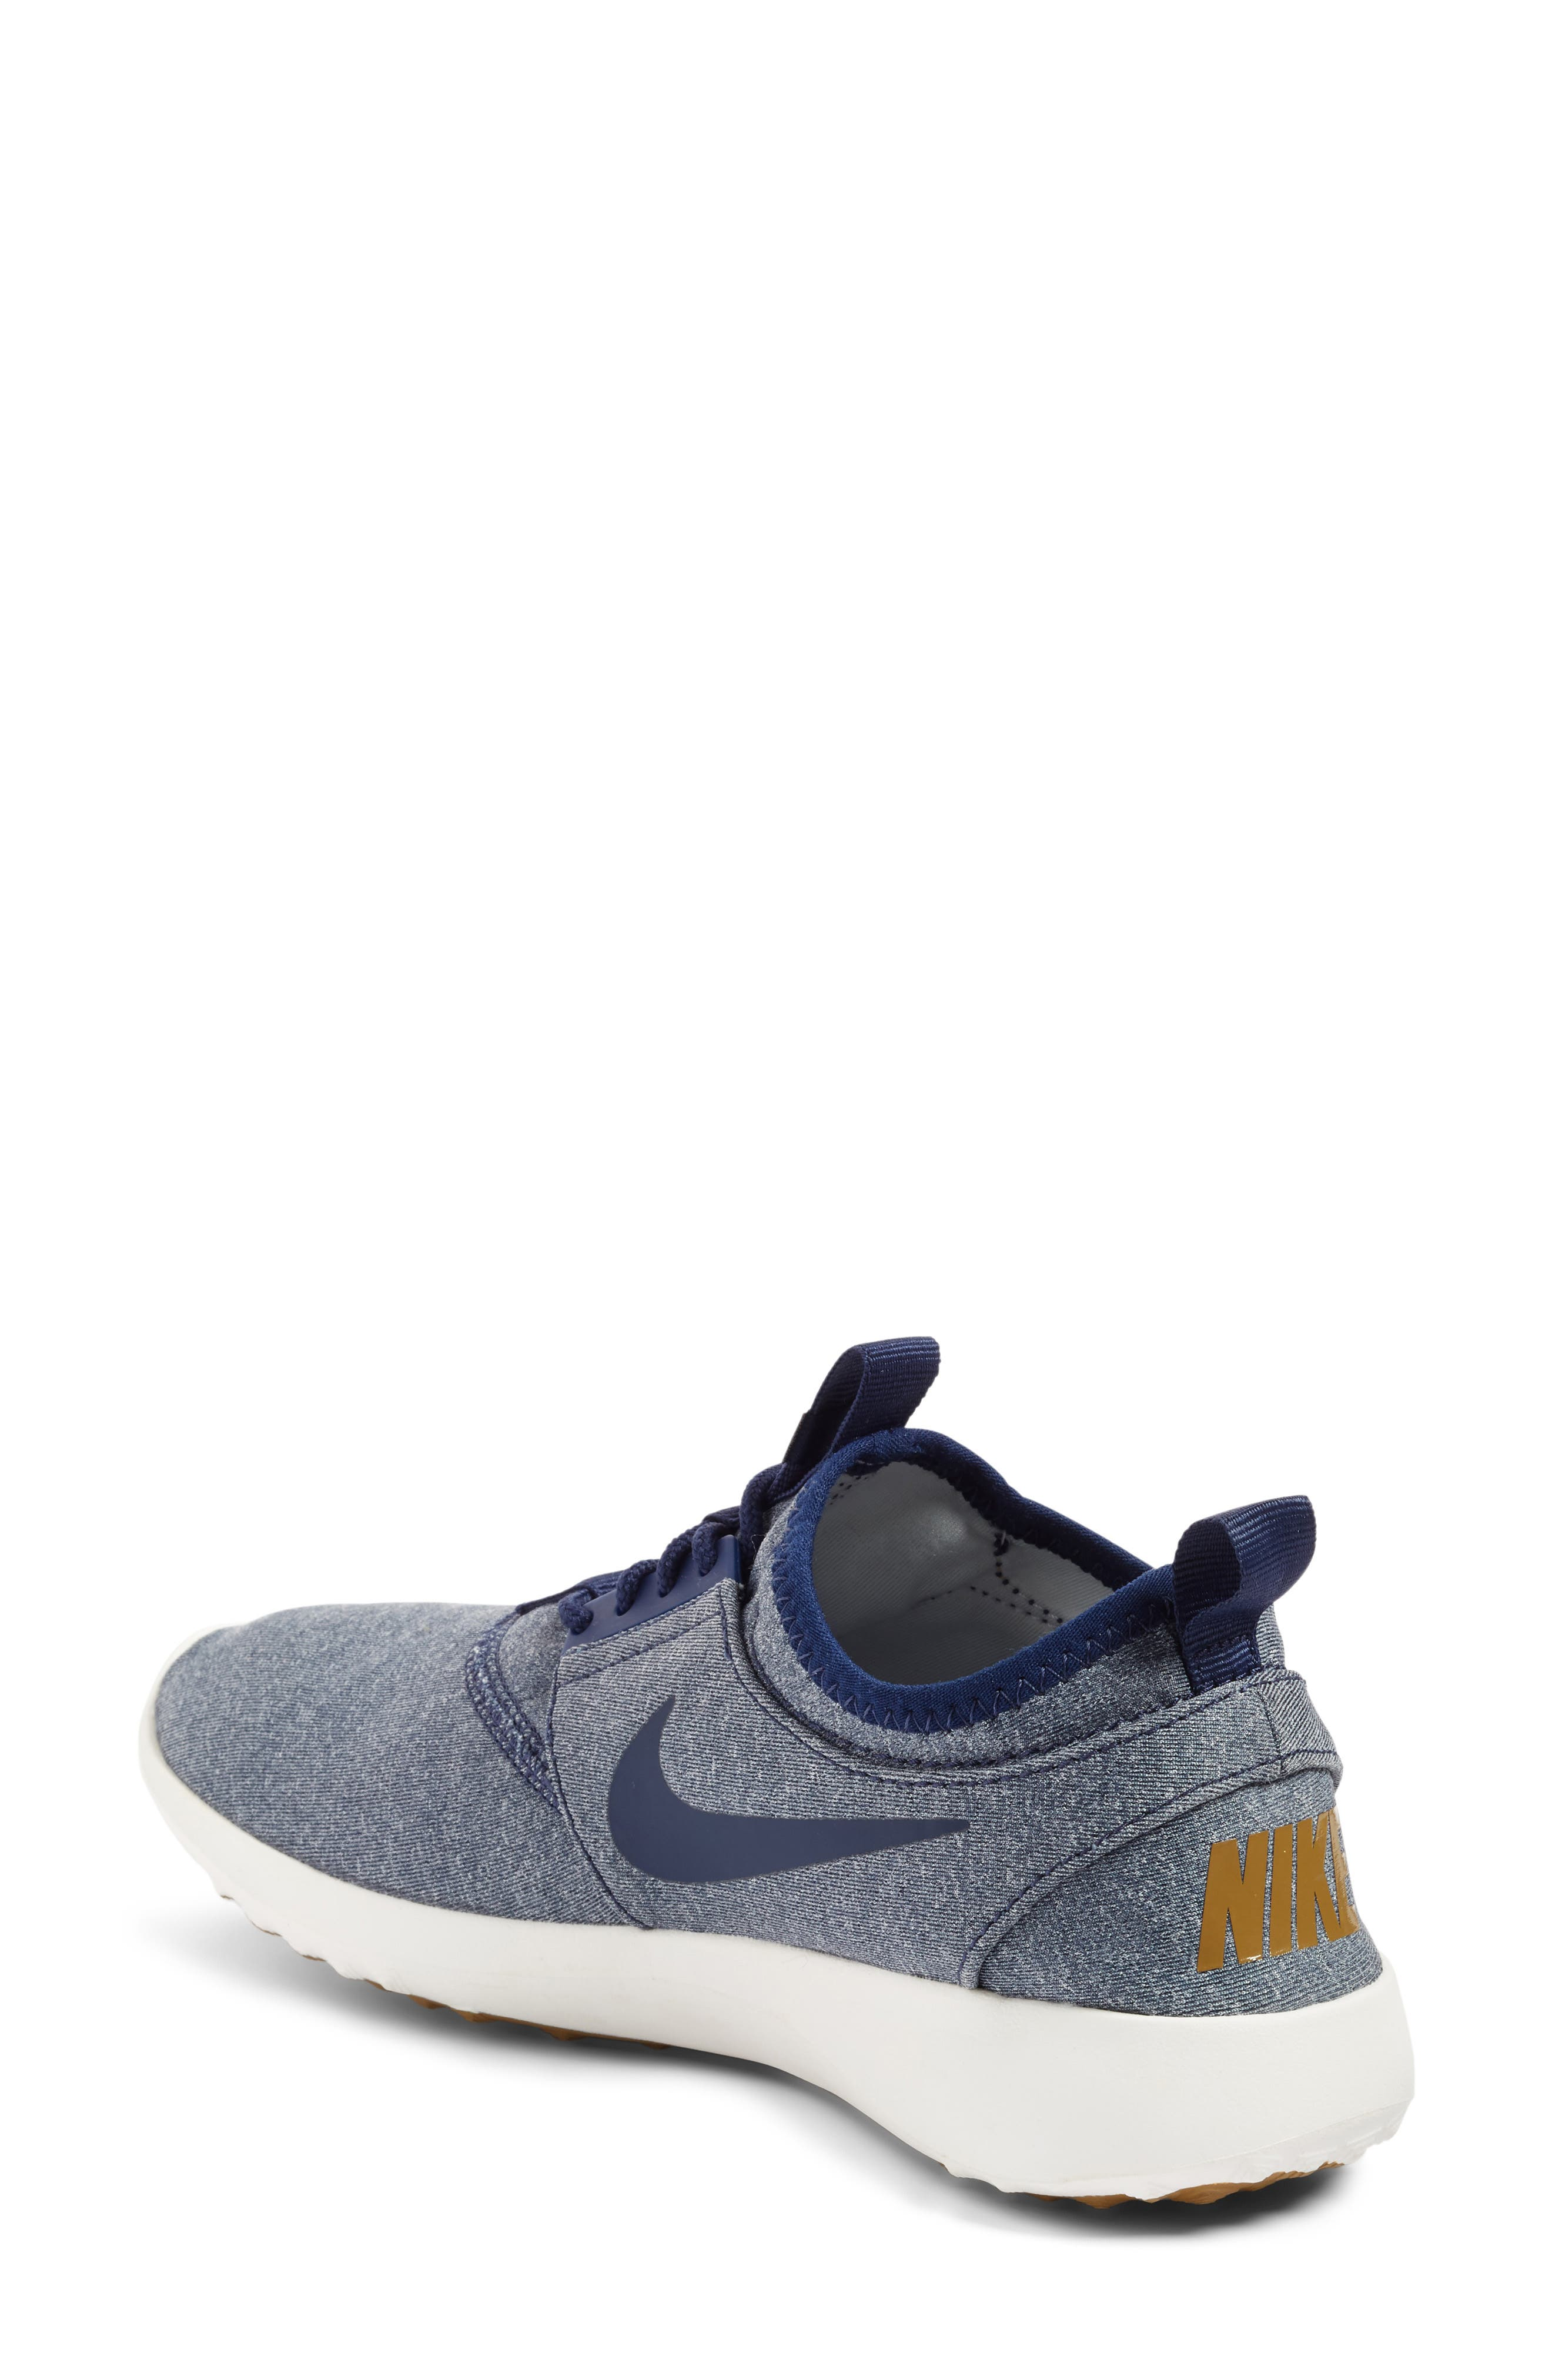 Juvenate SE Sneaker,                             Alternate thumbnail 30, color,